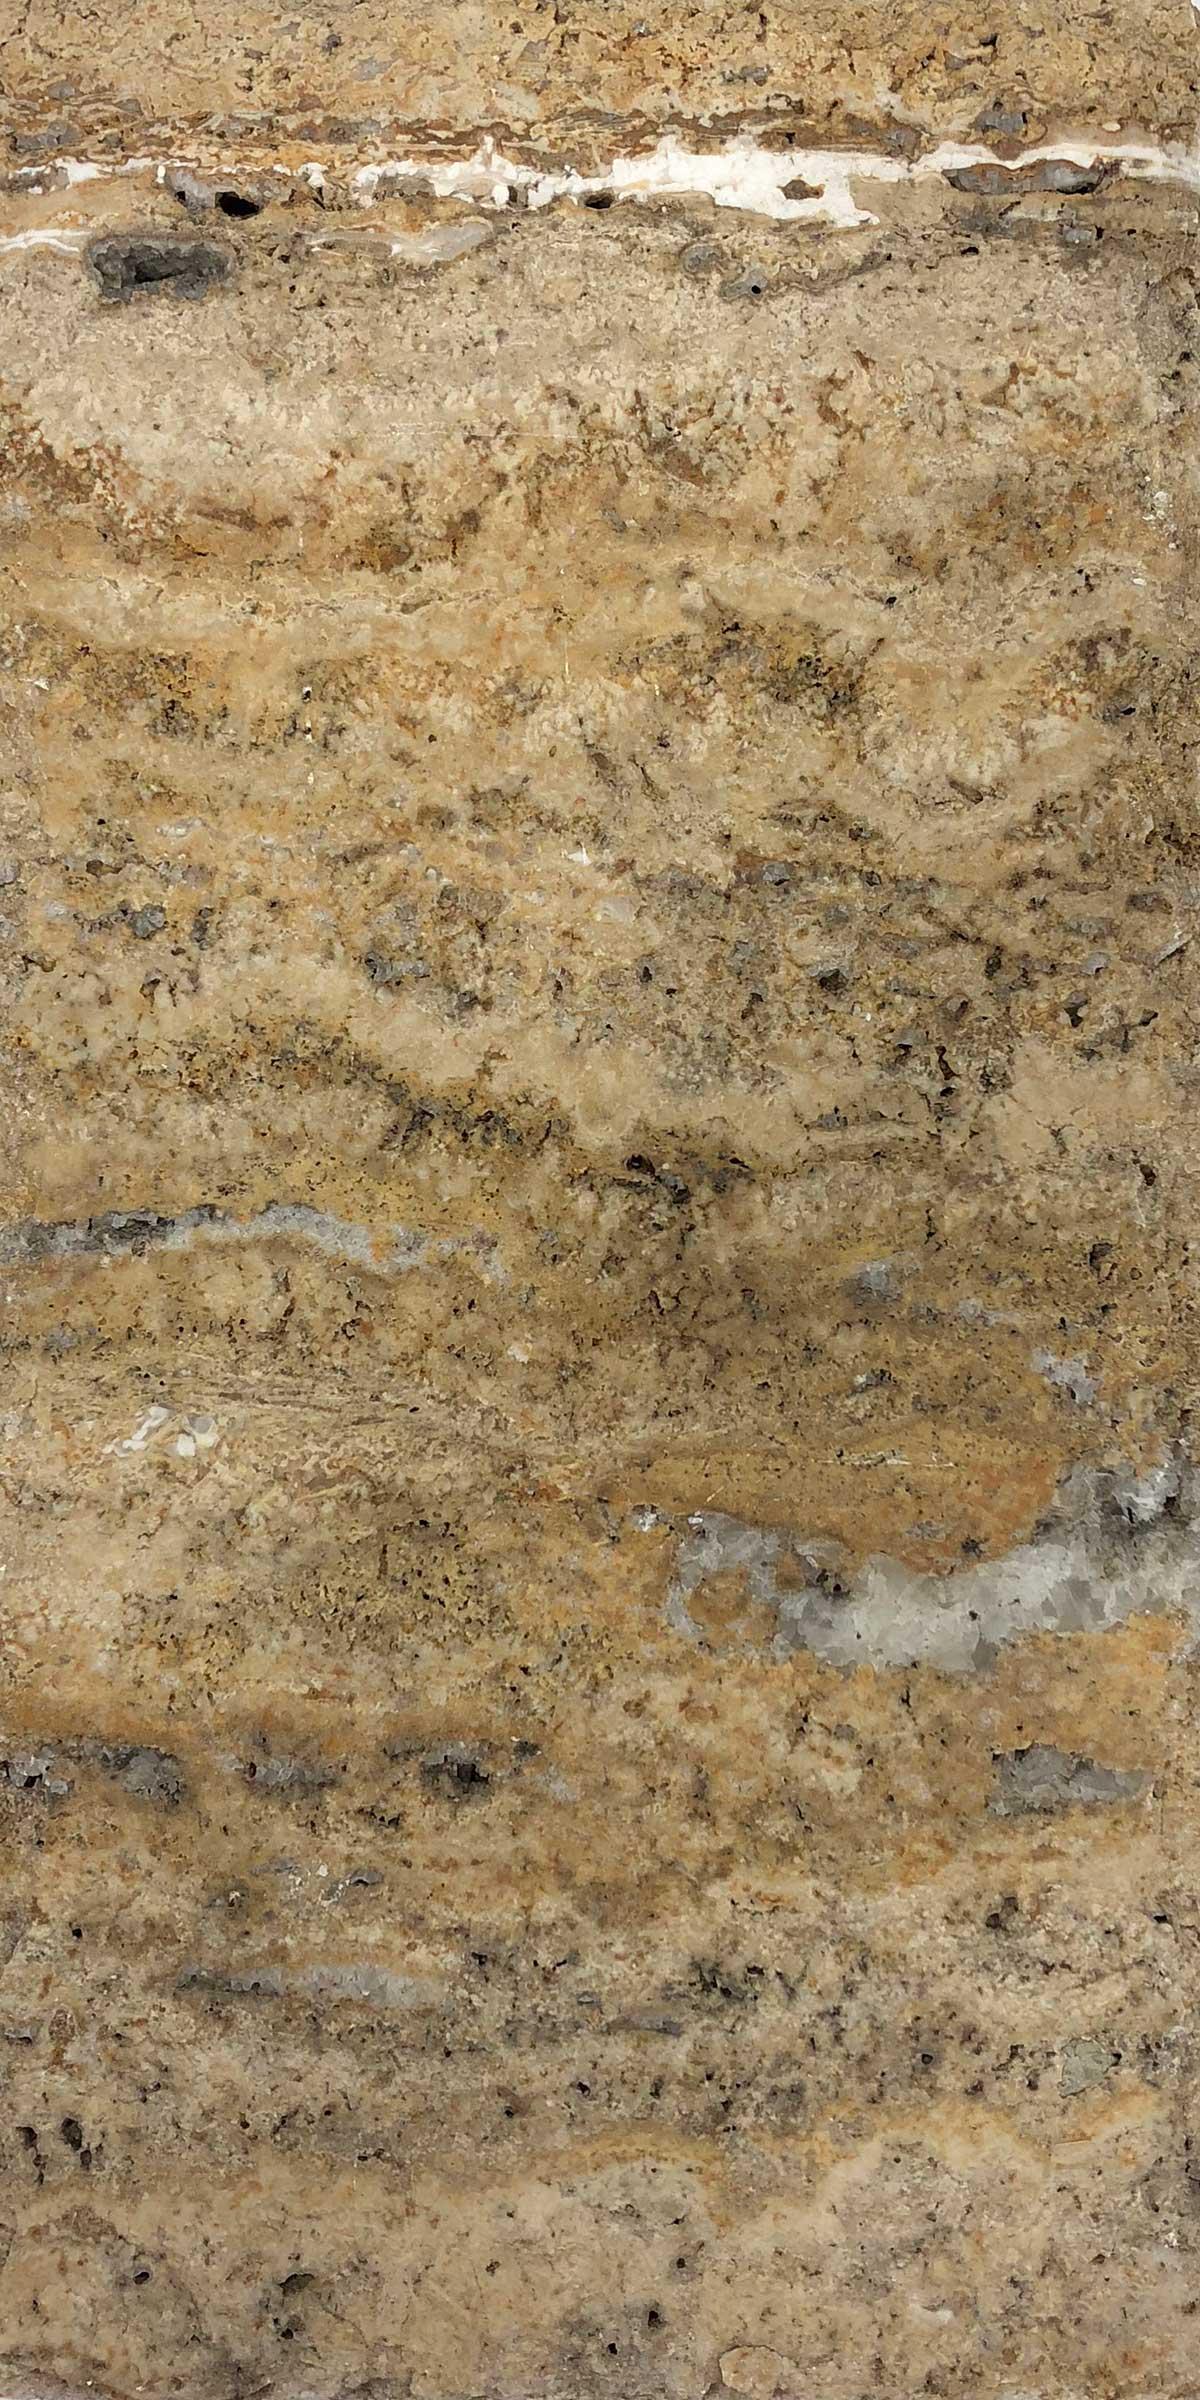 "Item #13330 - 6"" x 12"" Scabos Travertine Paver (Chiseled) Image"